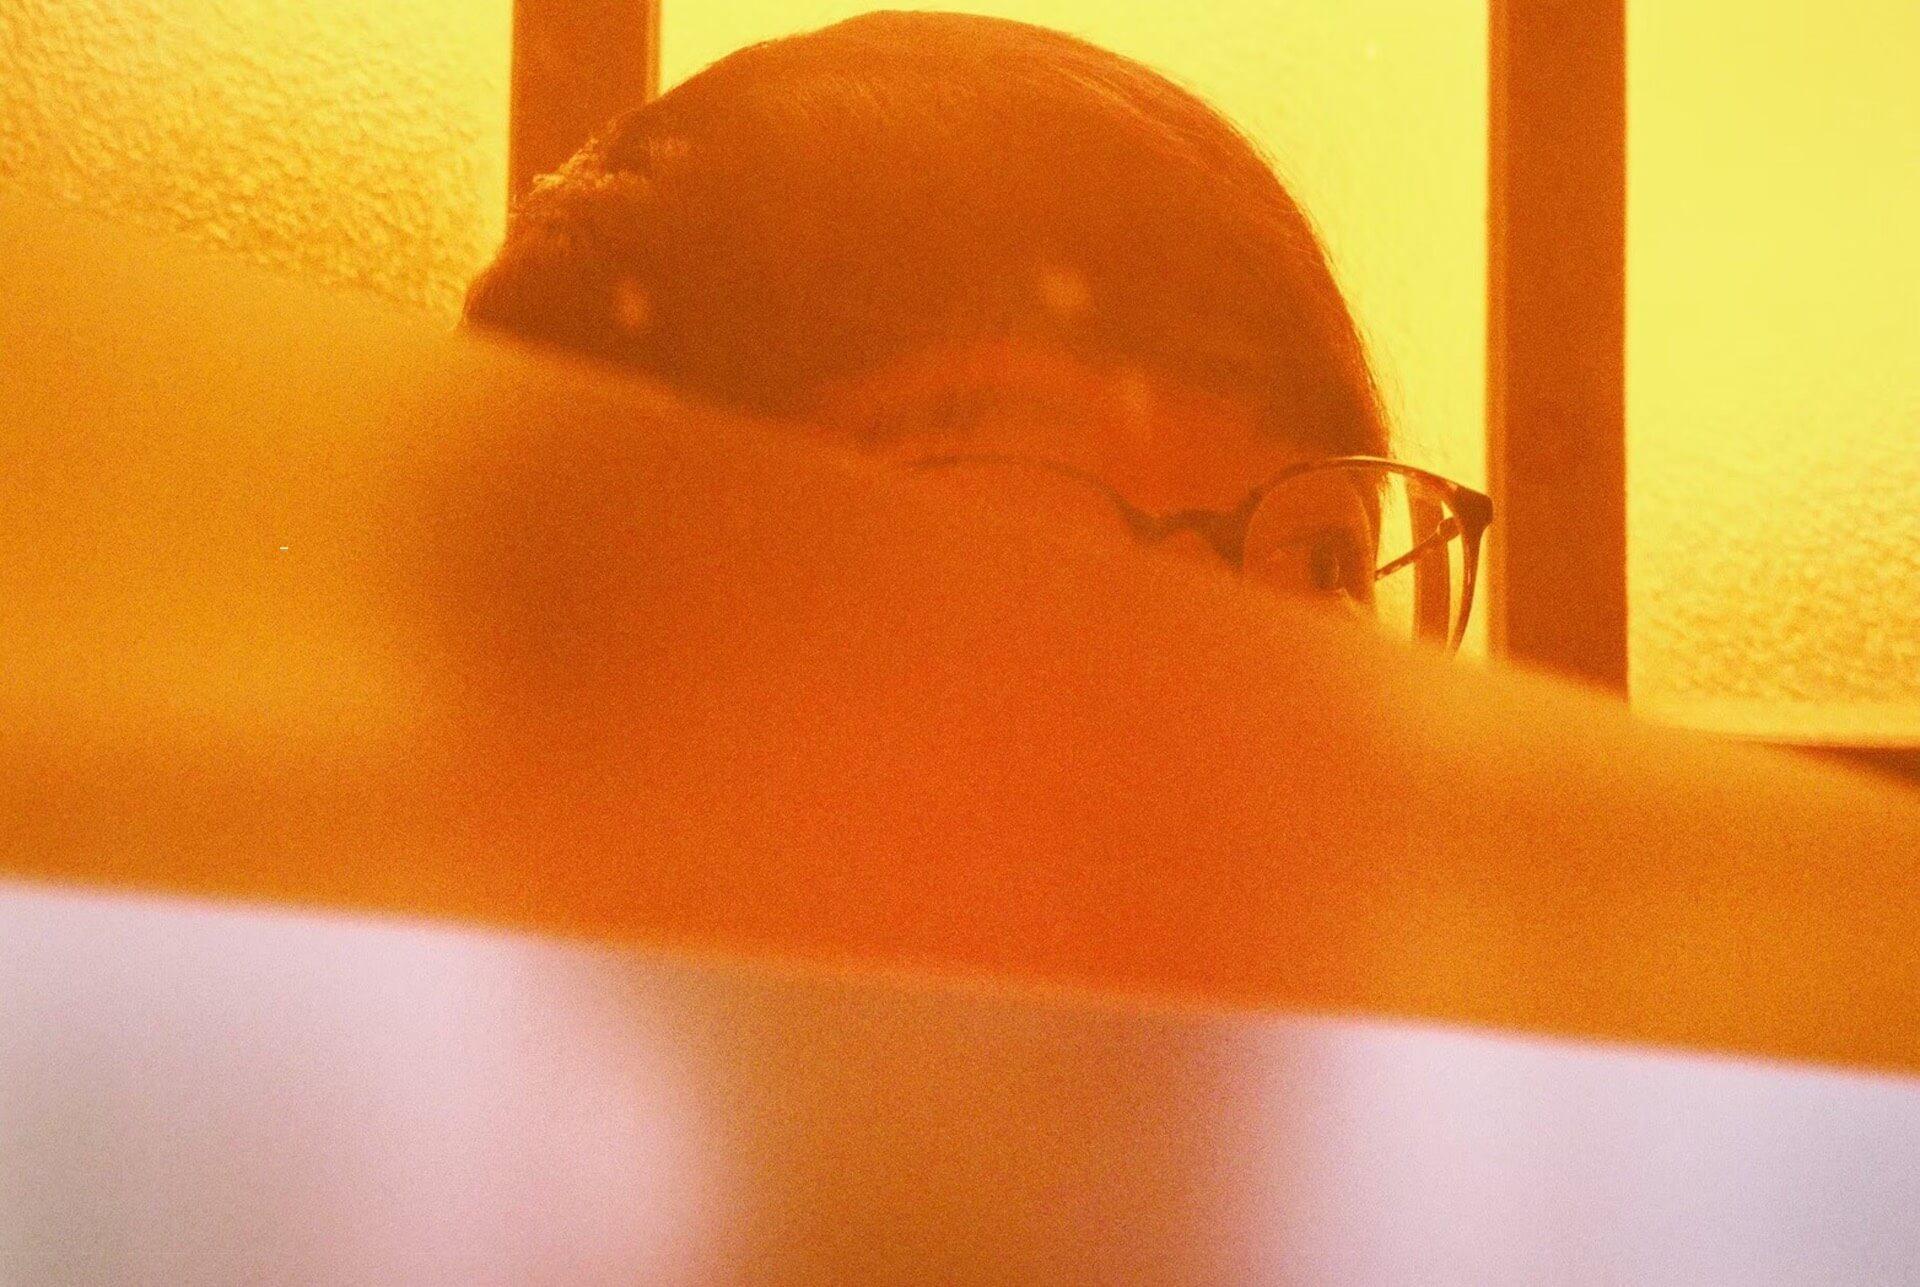 KENT VALLEY待望のミニアルバム『Momentary Note』がリリース!夏目知幸ら参加のレコ発イベントも京都Lenで開催決定 music200819_kentvalley_01